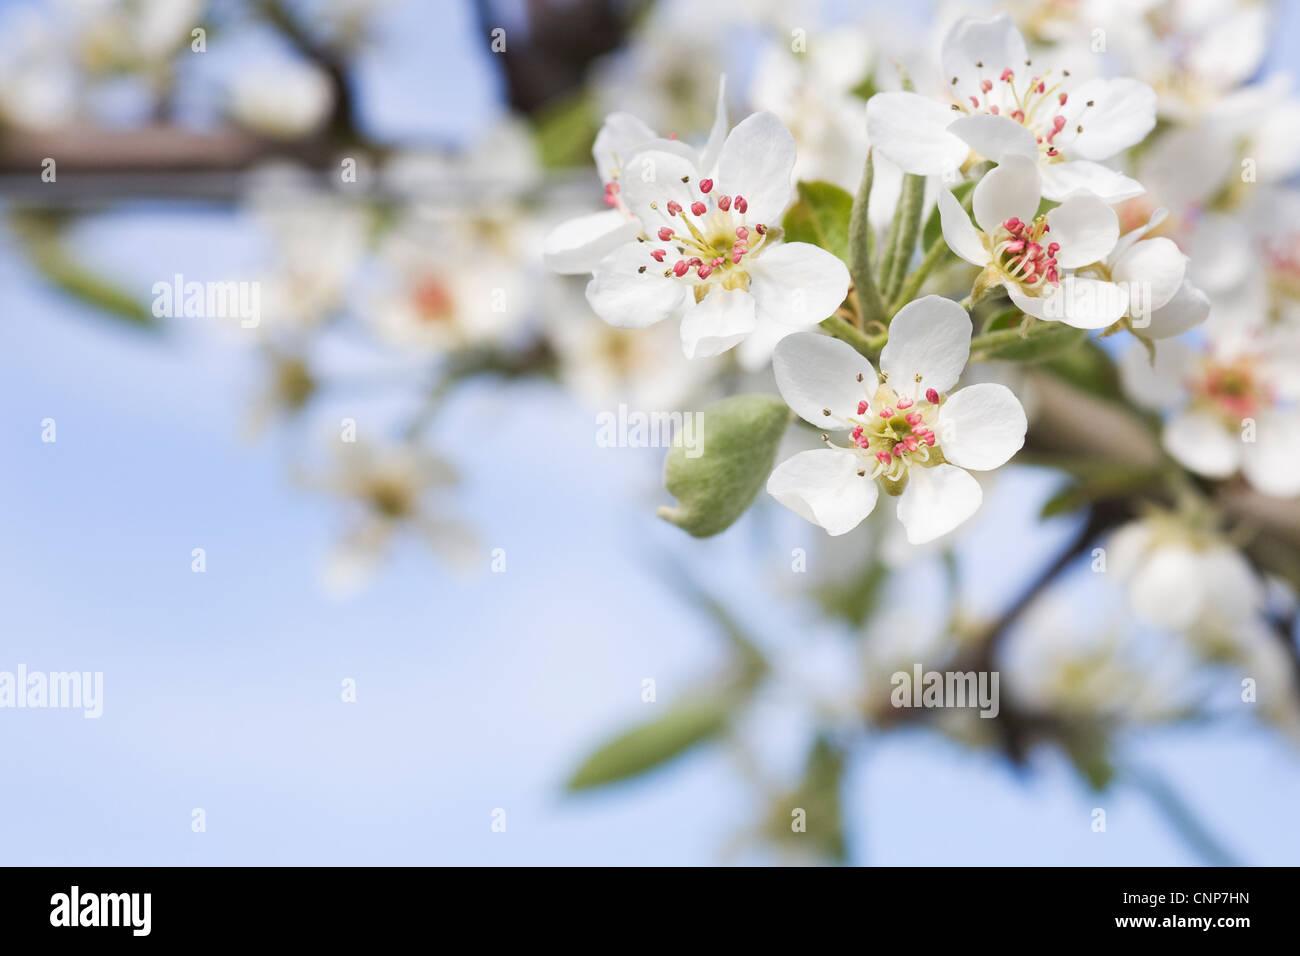 Pyrus communis 'Black Worcester'. Pear blossom 'Black Worcester'against a blue sky. - Stock Image